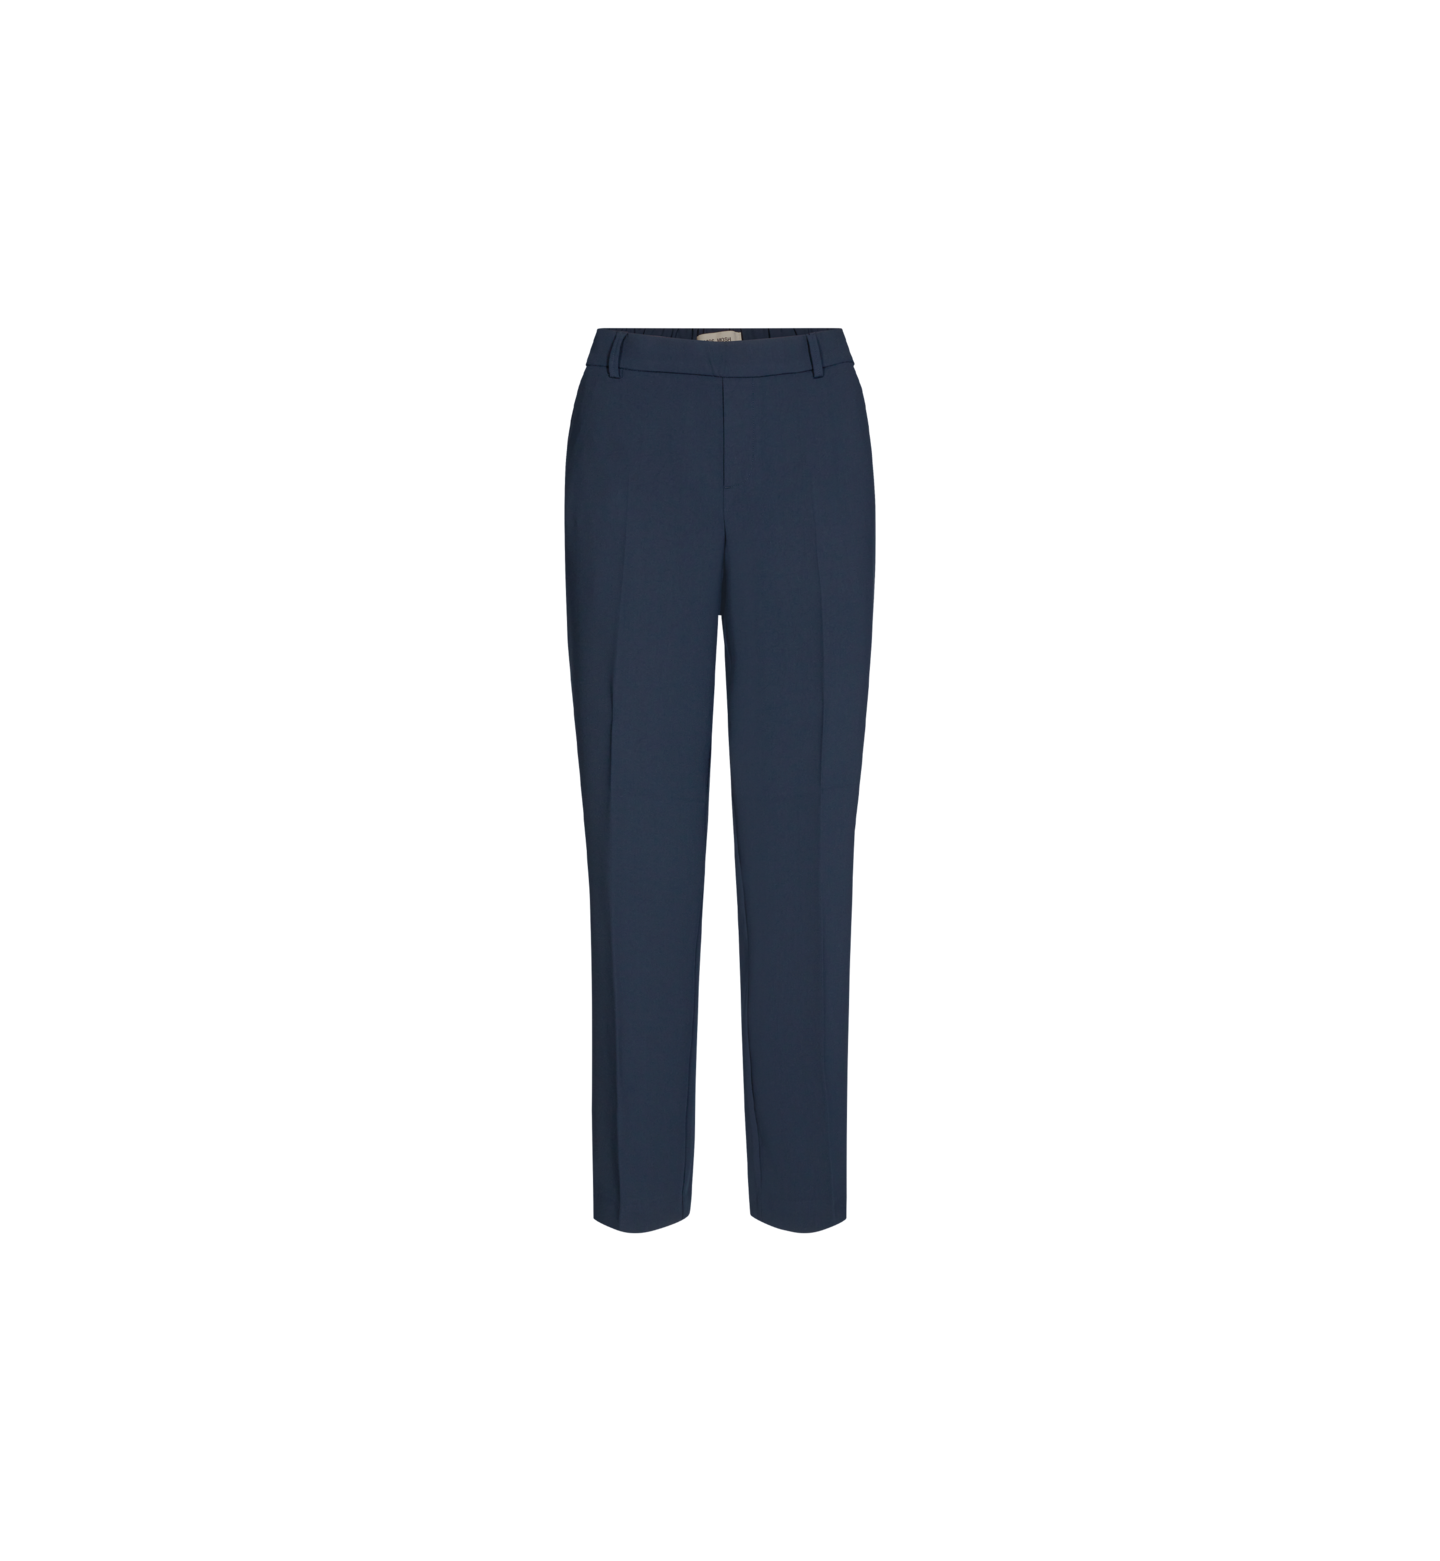 Donkerblauwe dames broek Mos Mosh - Bai Leia Pants 137930-801